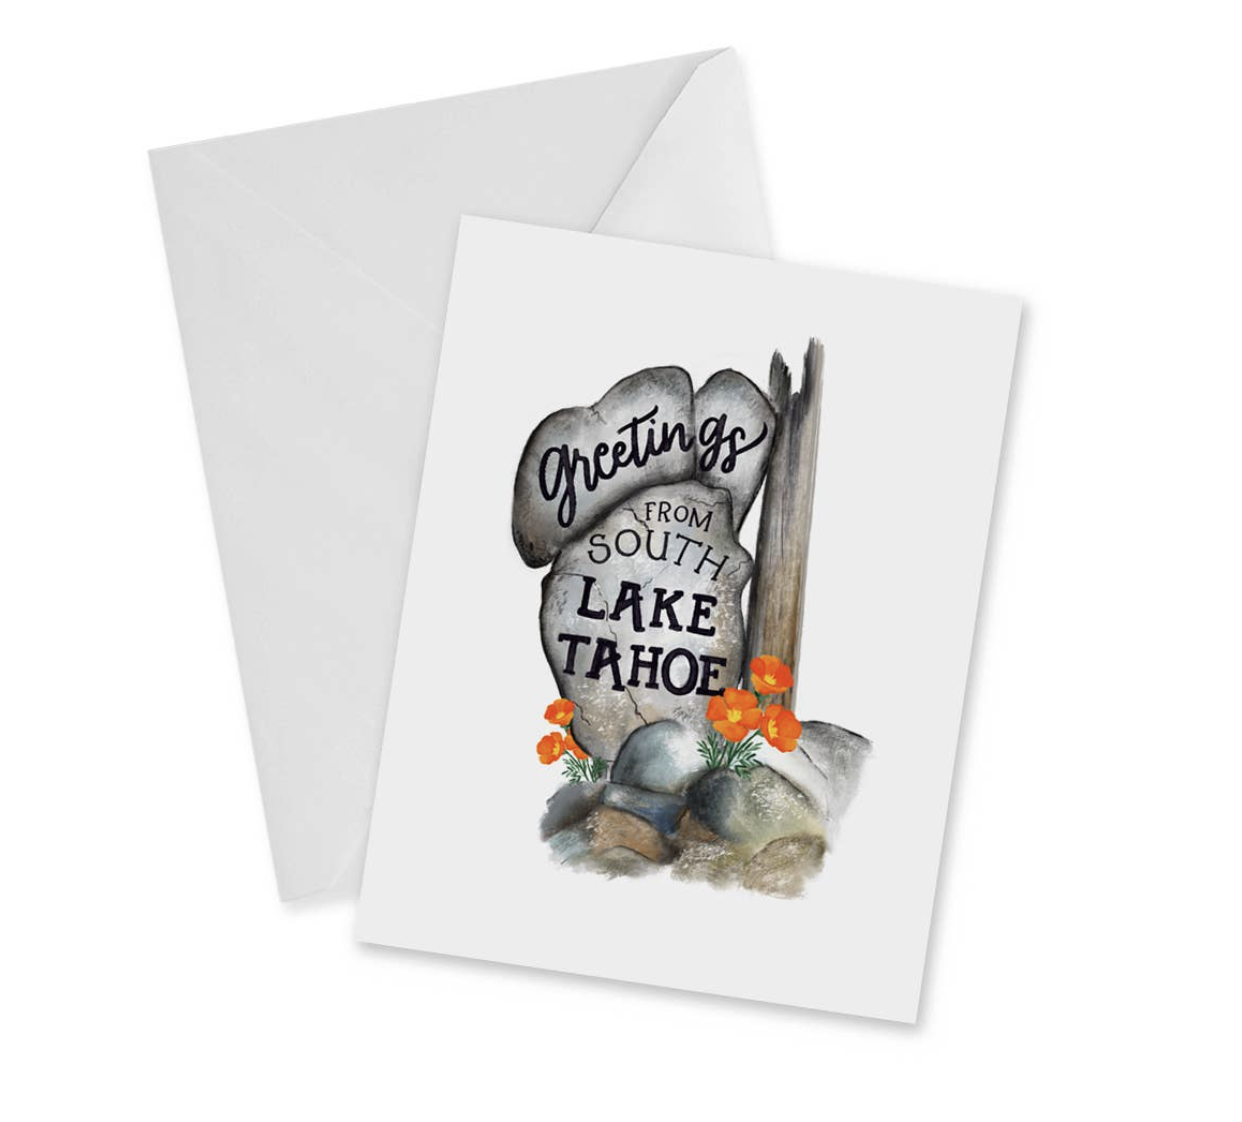 """Greetings from South Lake Tahoe,"" Blank Greeting Card"